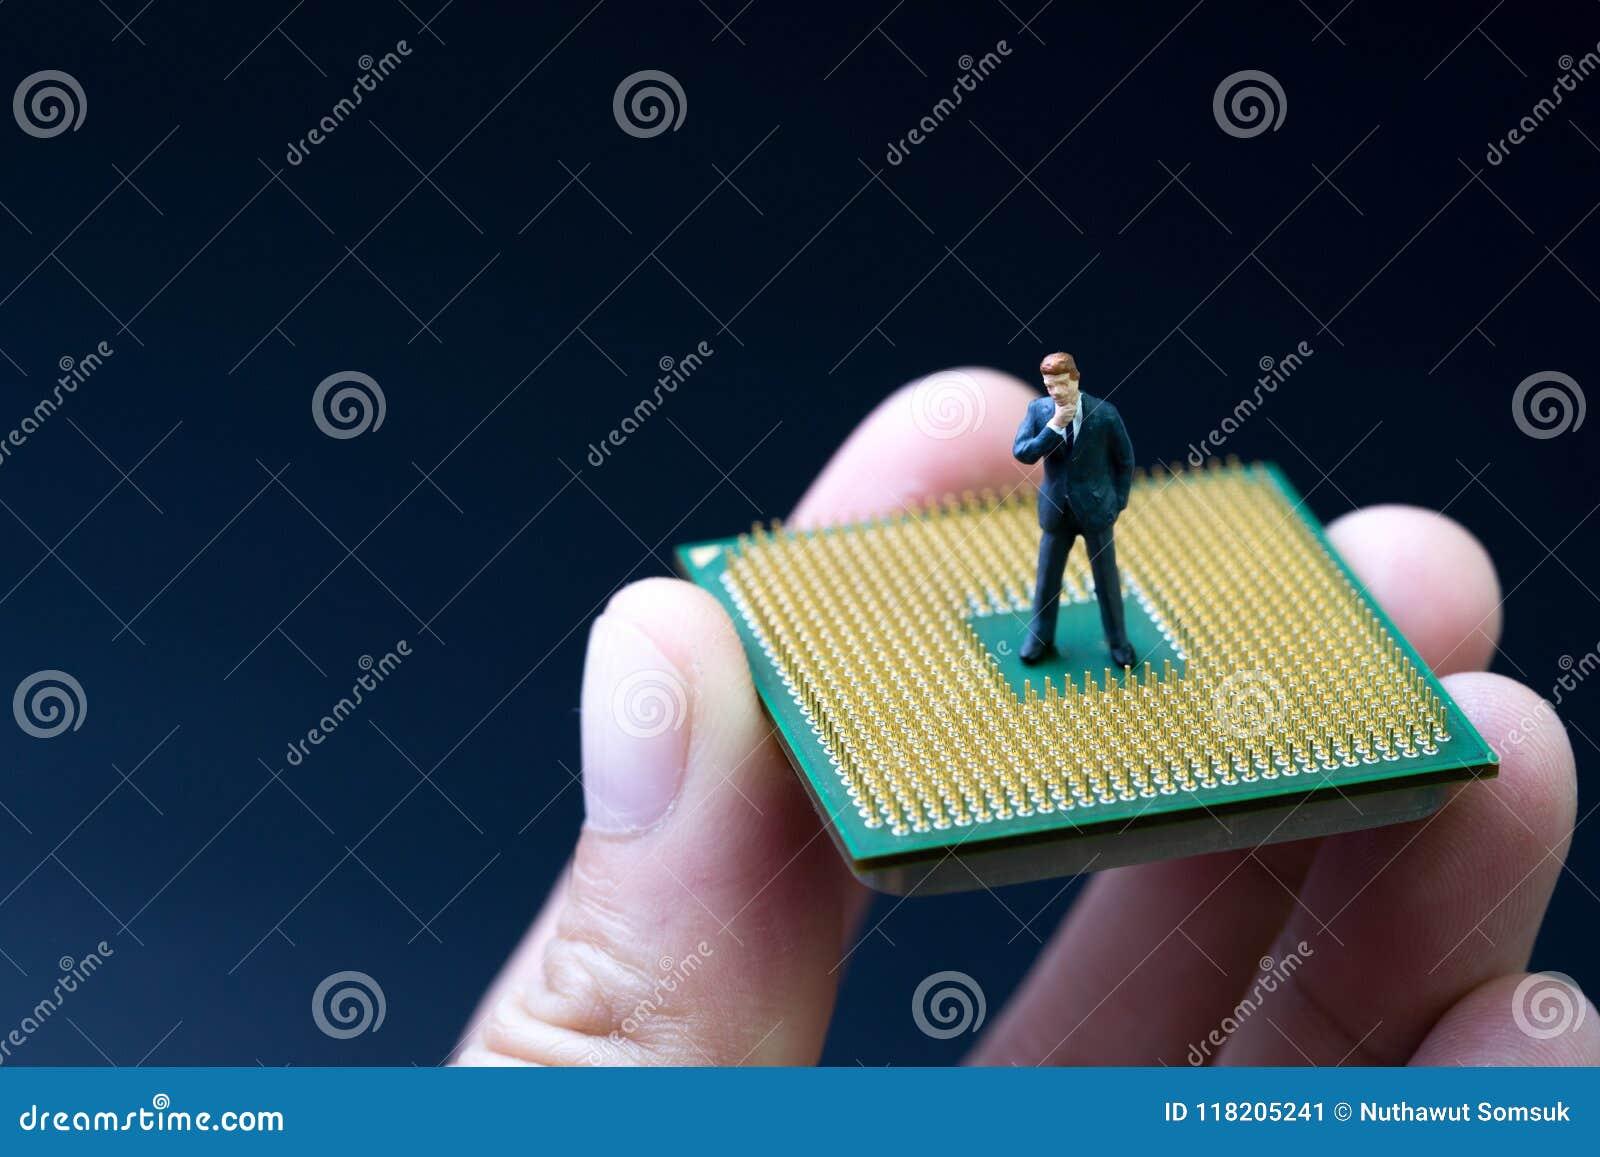 AI, τεχνητή νοημοσύνη, έννοια εκμάθησης μηχανών, μικροσκοπική